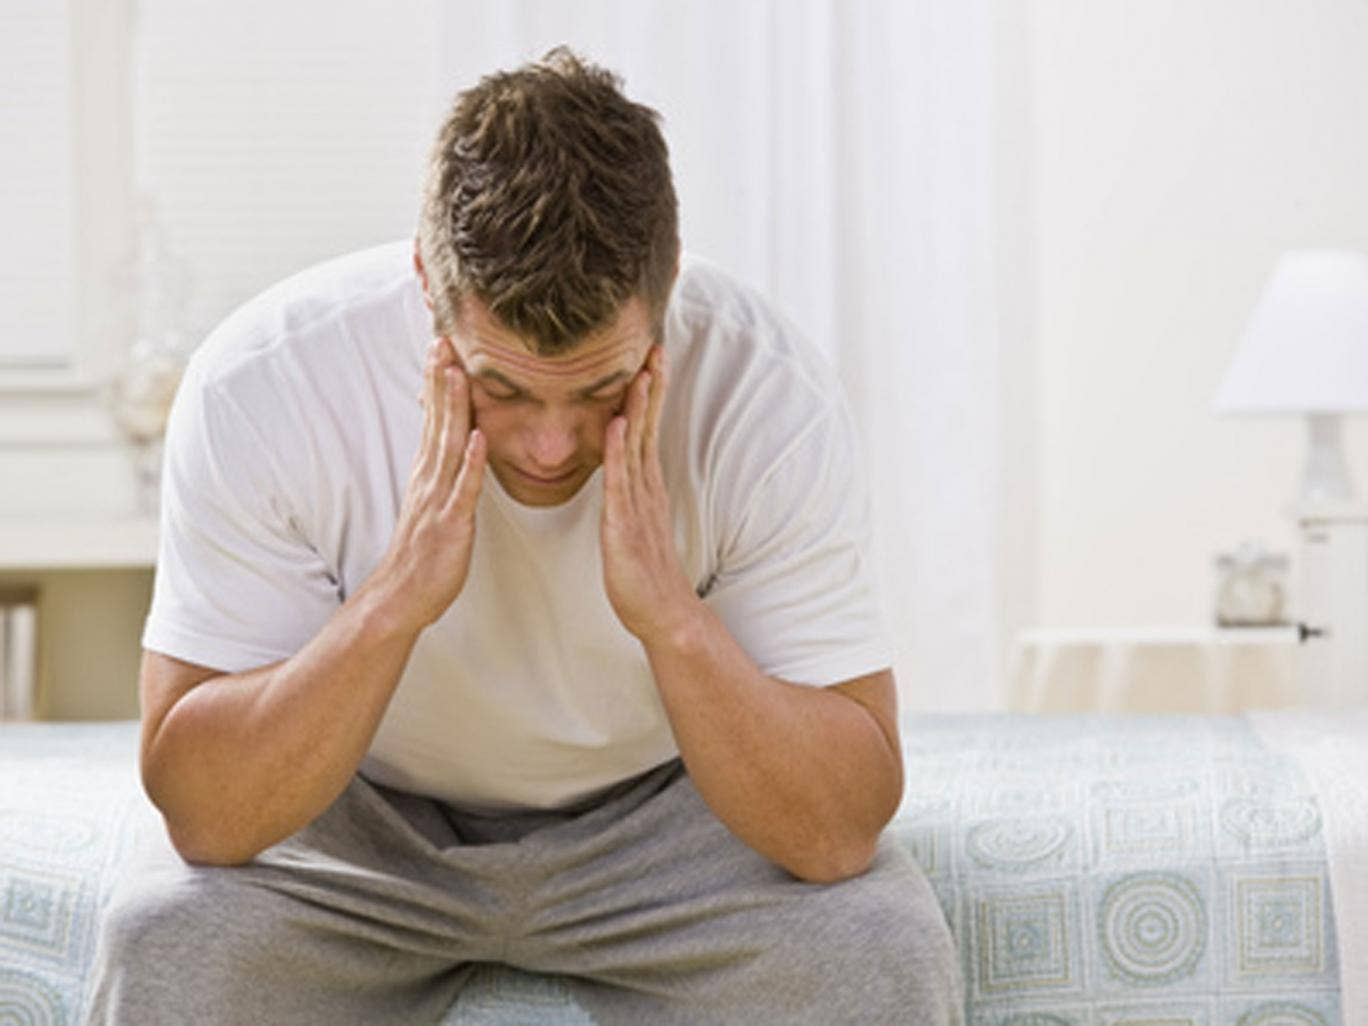 A lack of sleep has a negative impact